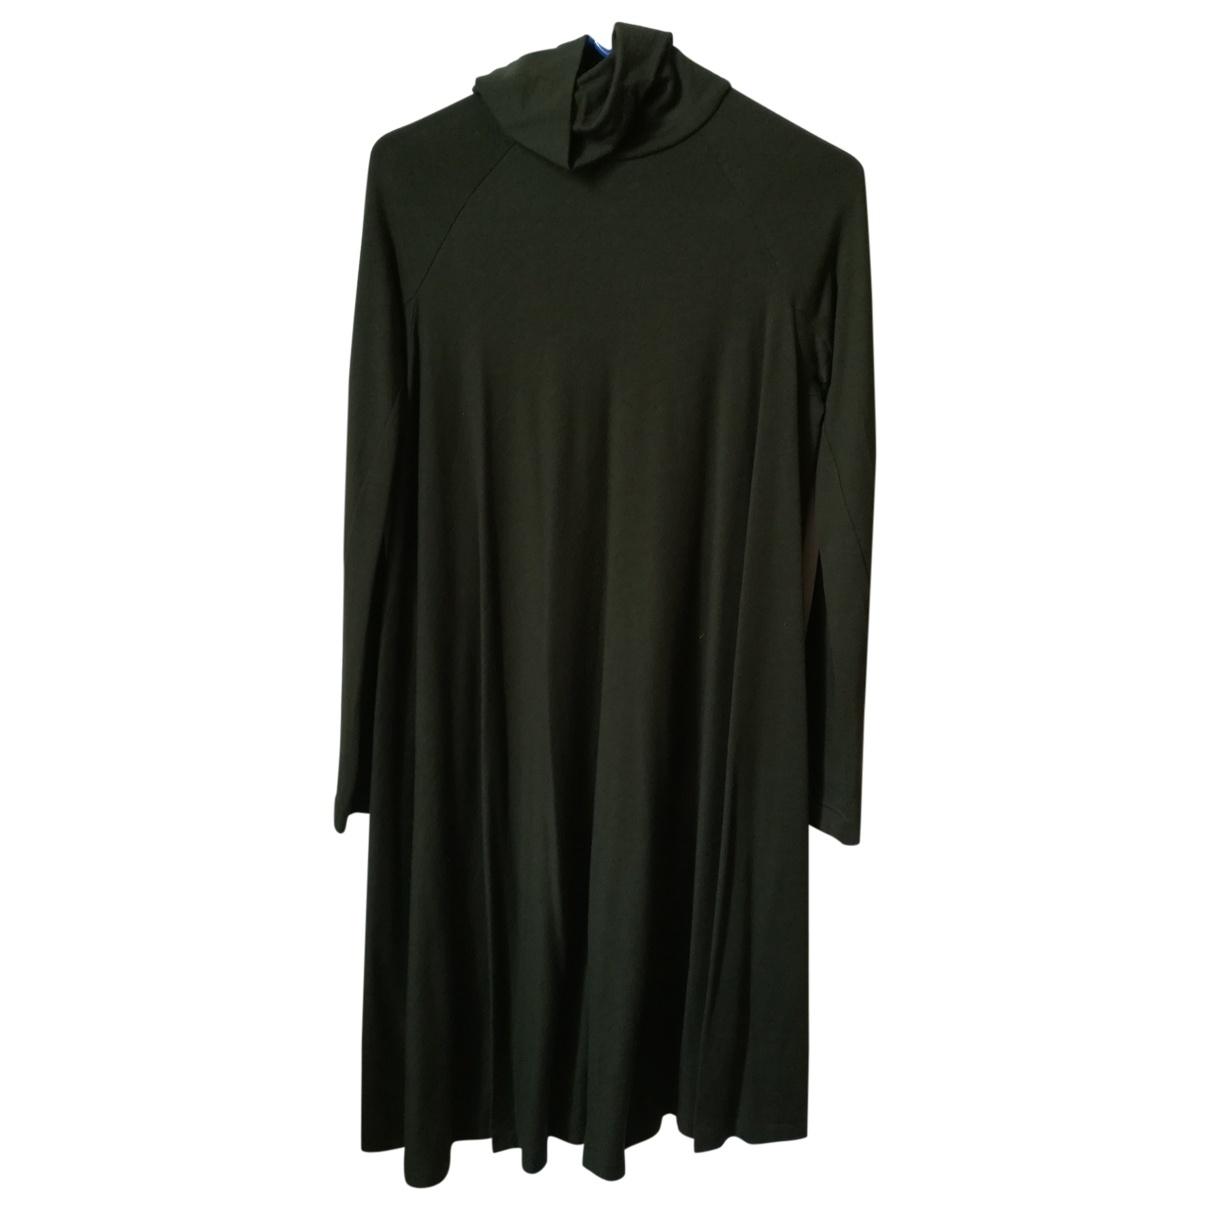 Aspesi \N Kleid in  Gruen Wolle